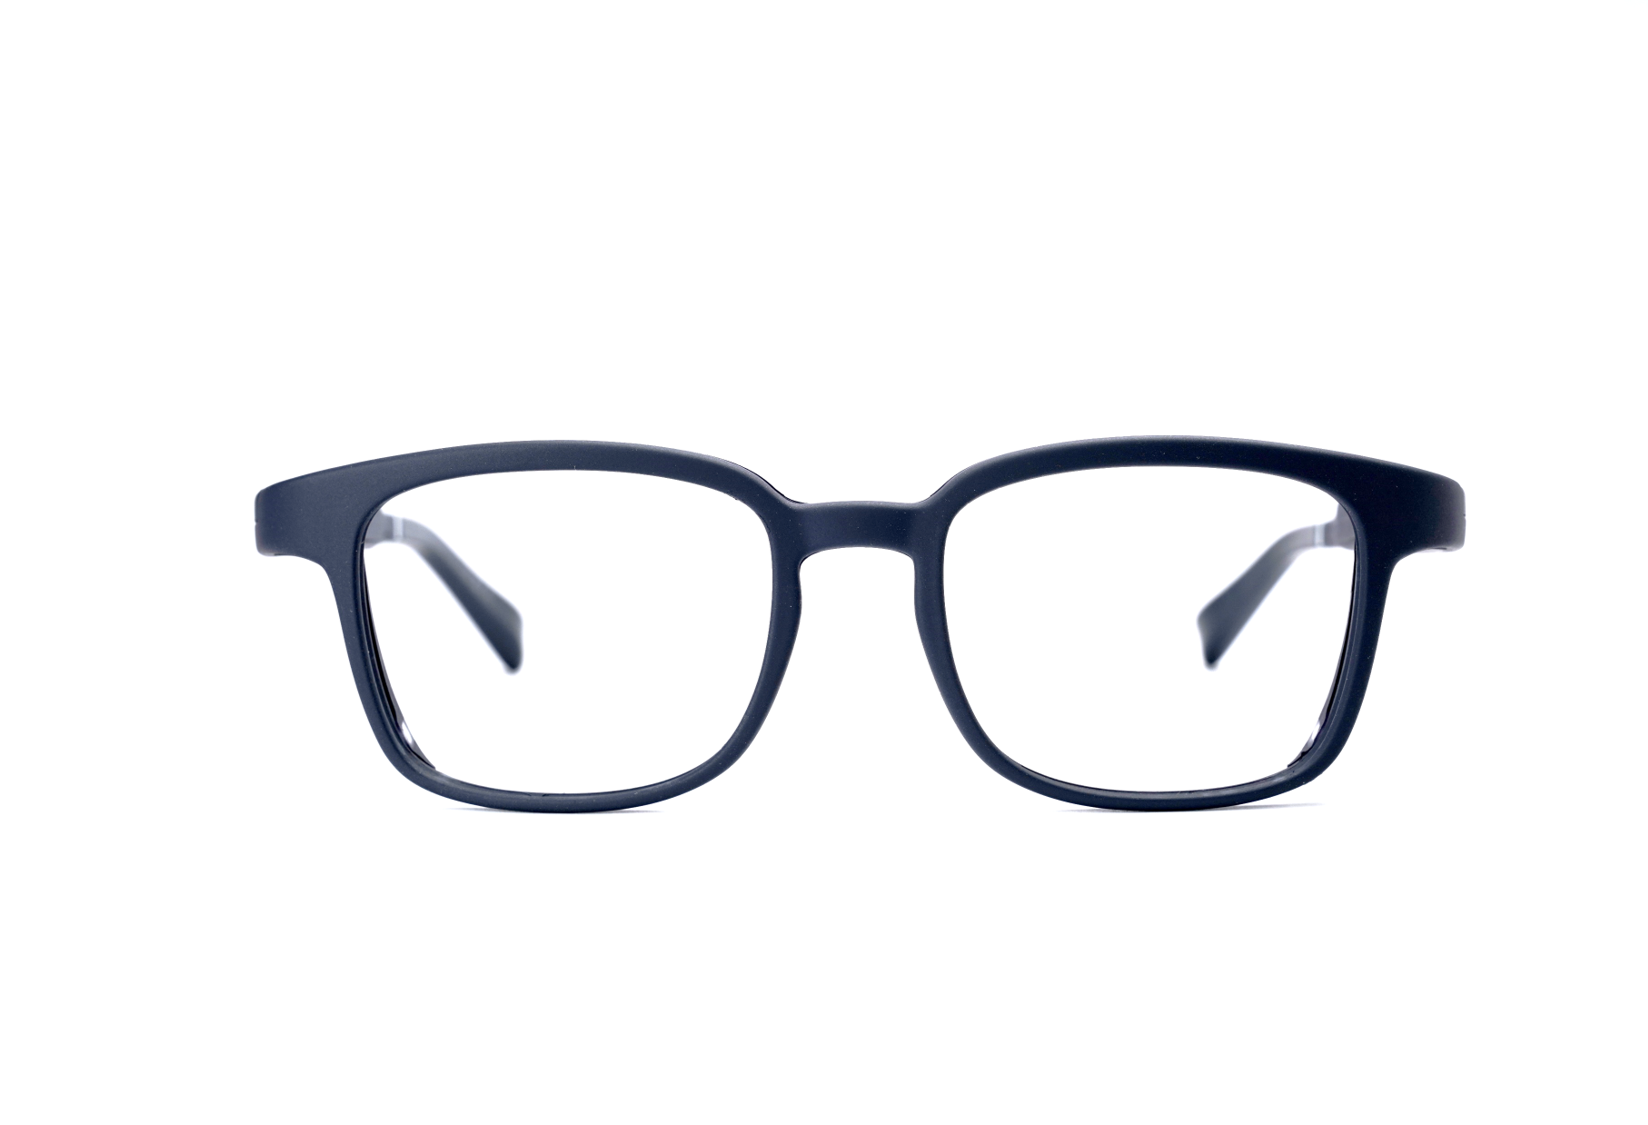 Serenity Eyewear Carré bleu foncé face